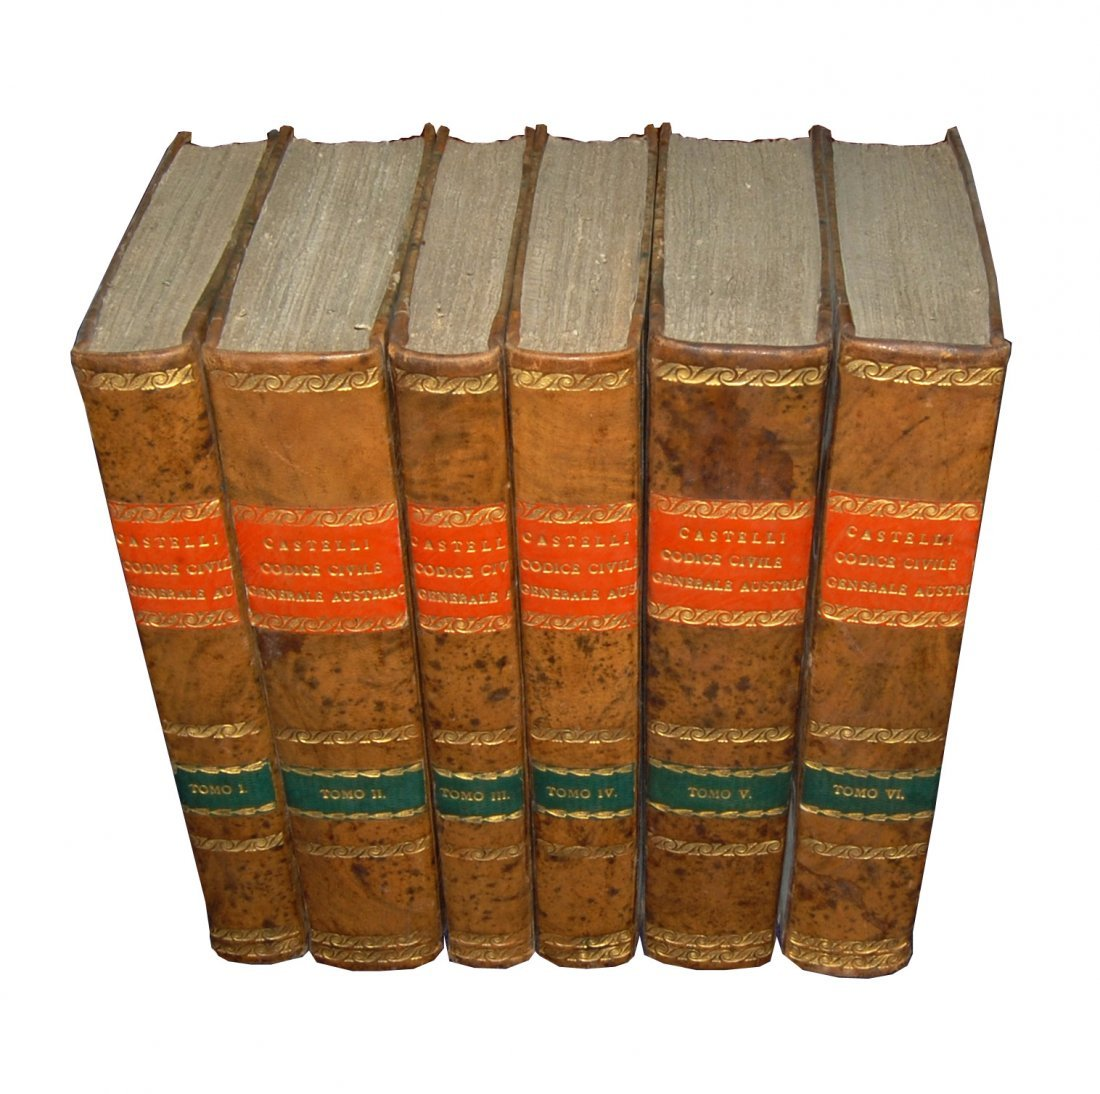 [Austrian Code and Roman Law] Castelli, 1831-32, 6 vols